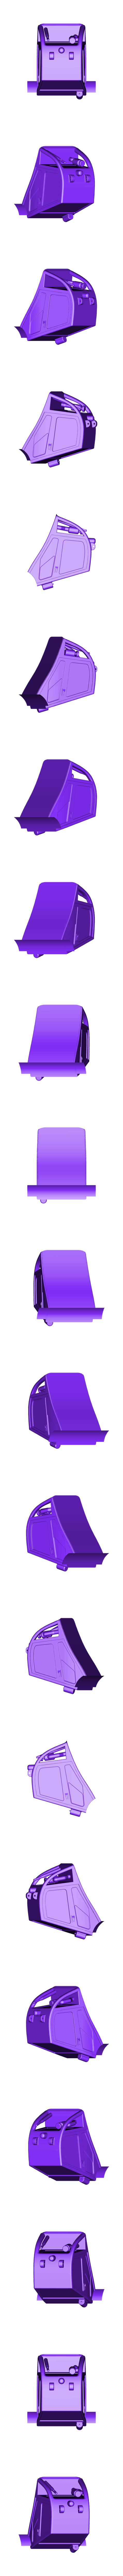 upper_body_black.stl Download free STL file Fenwick Linde H40 forklift with moving parts • 3D printer design, xTremePower